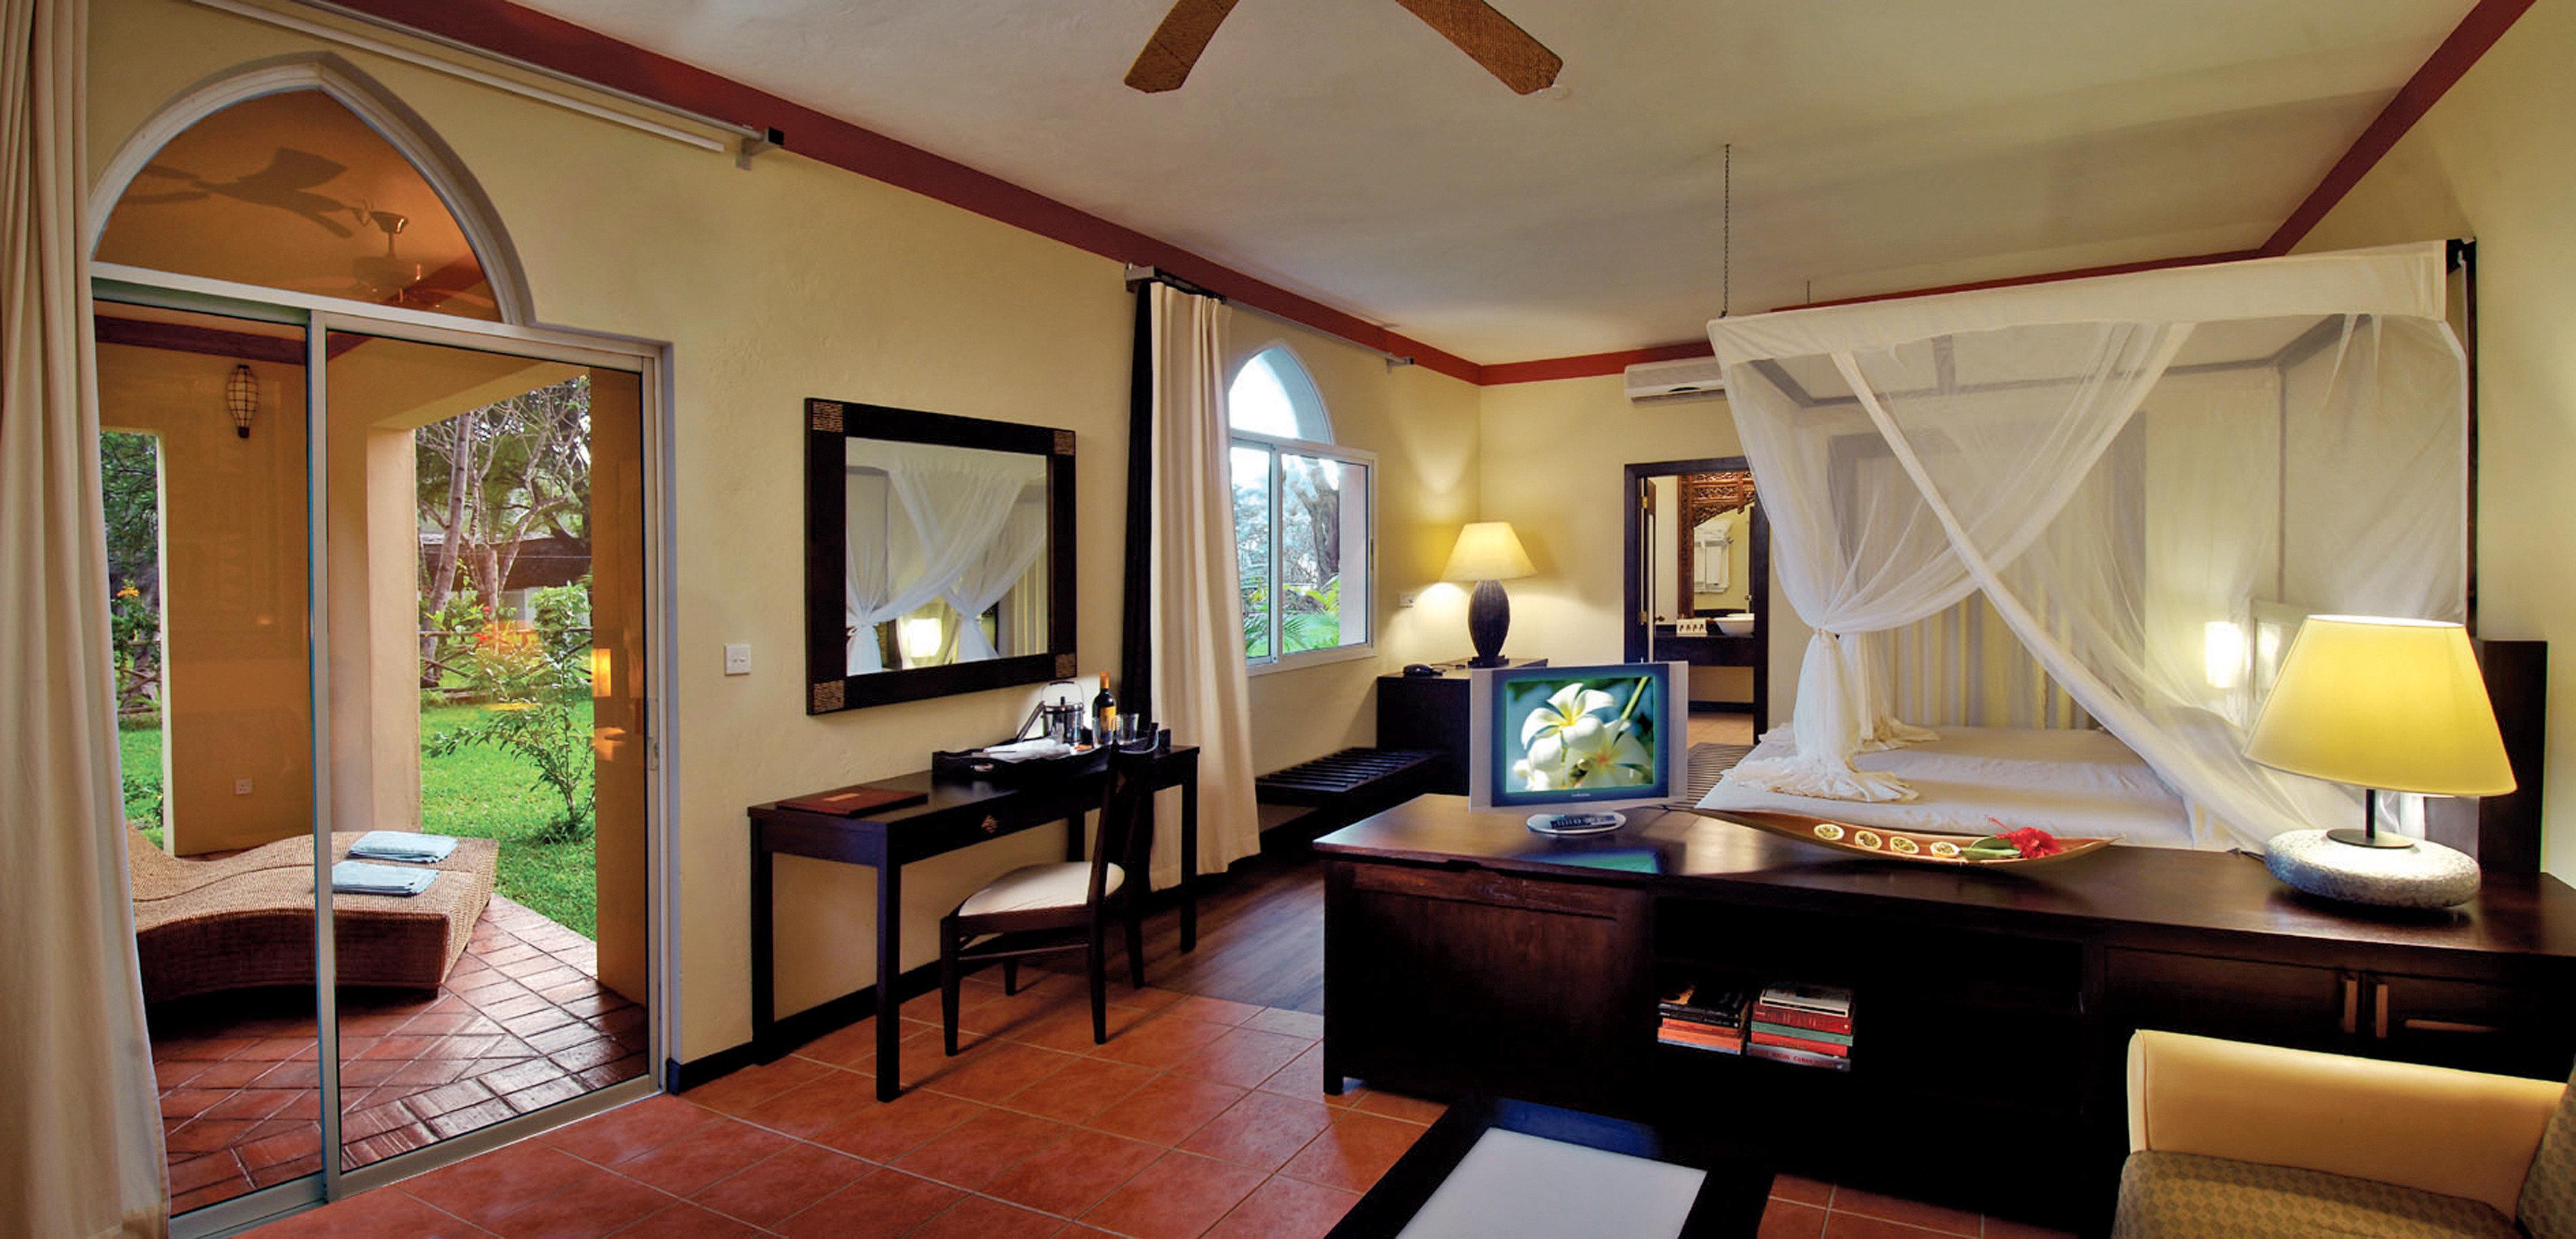 Bedroom Resort Romance Romantic property living room Suite home Villa cottage mansion condominium